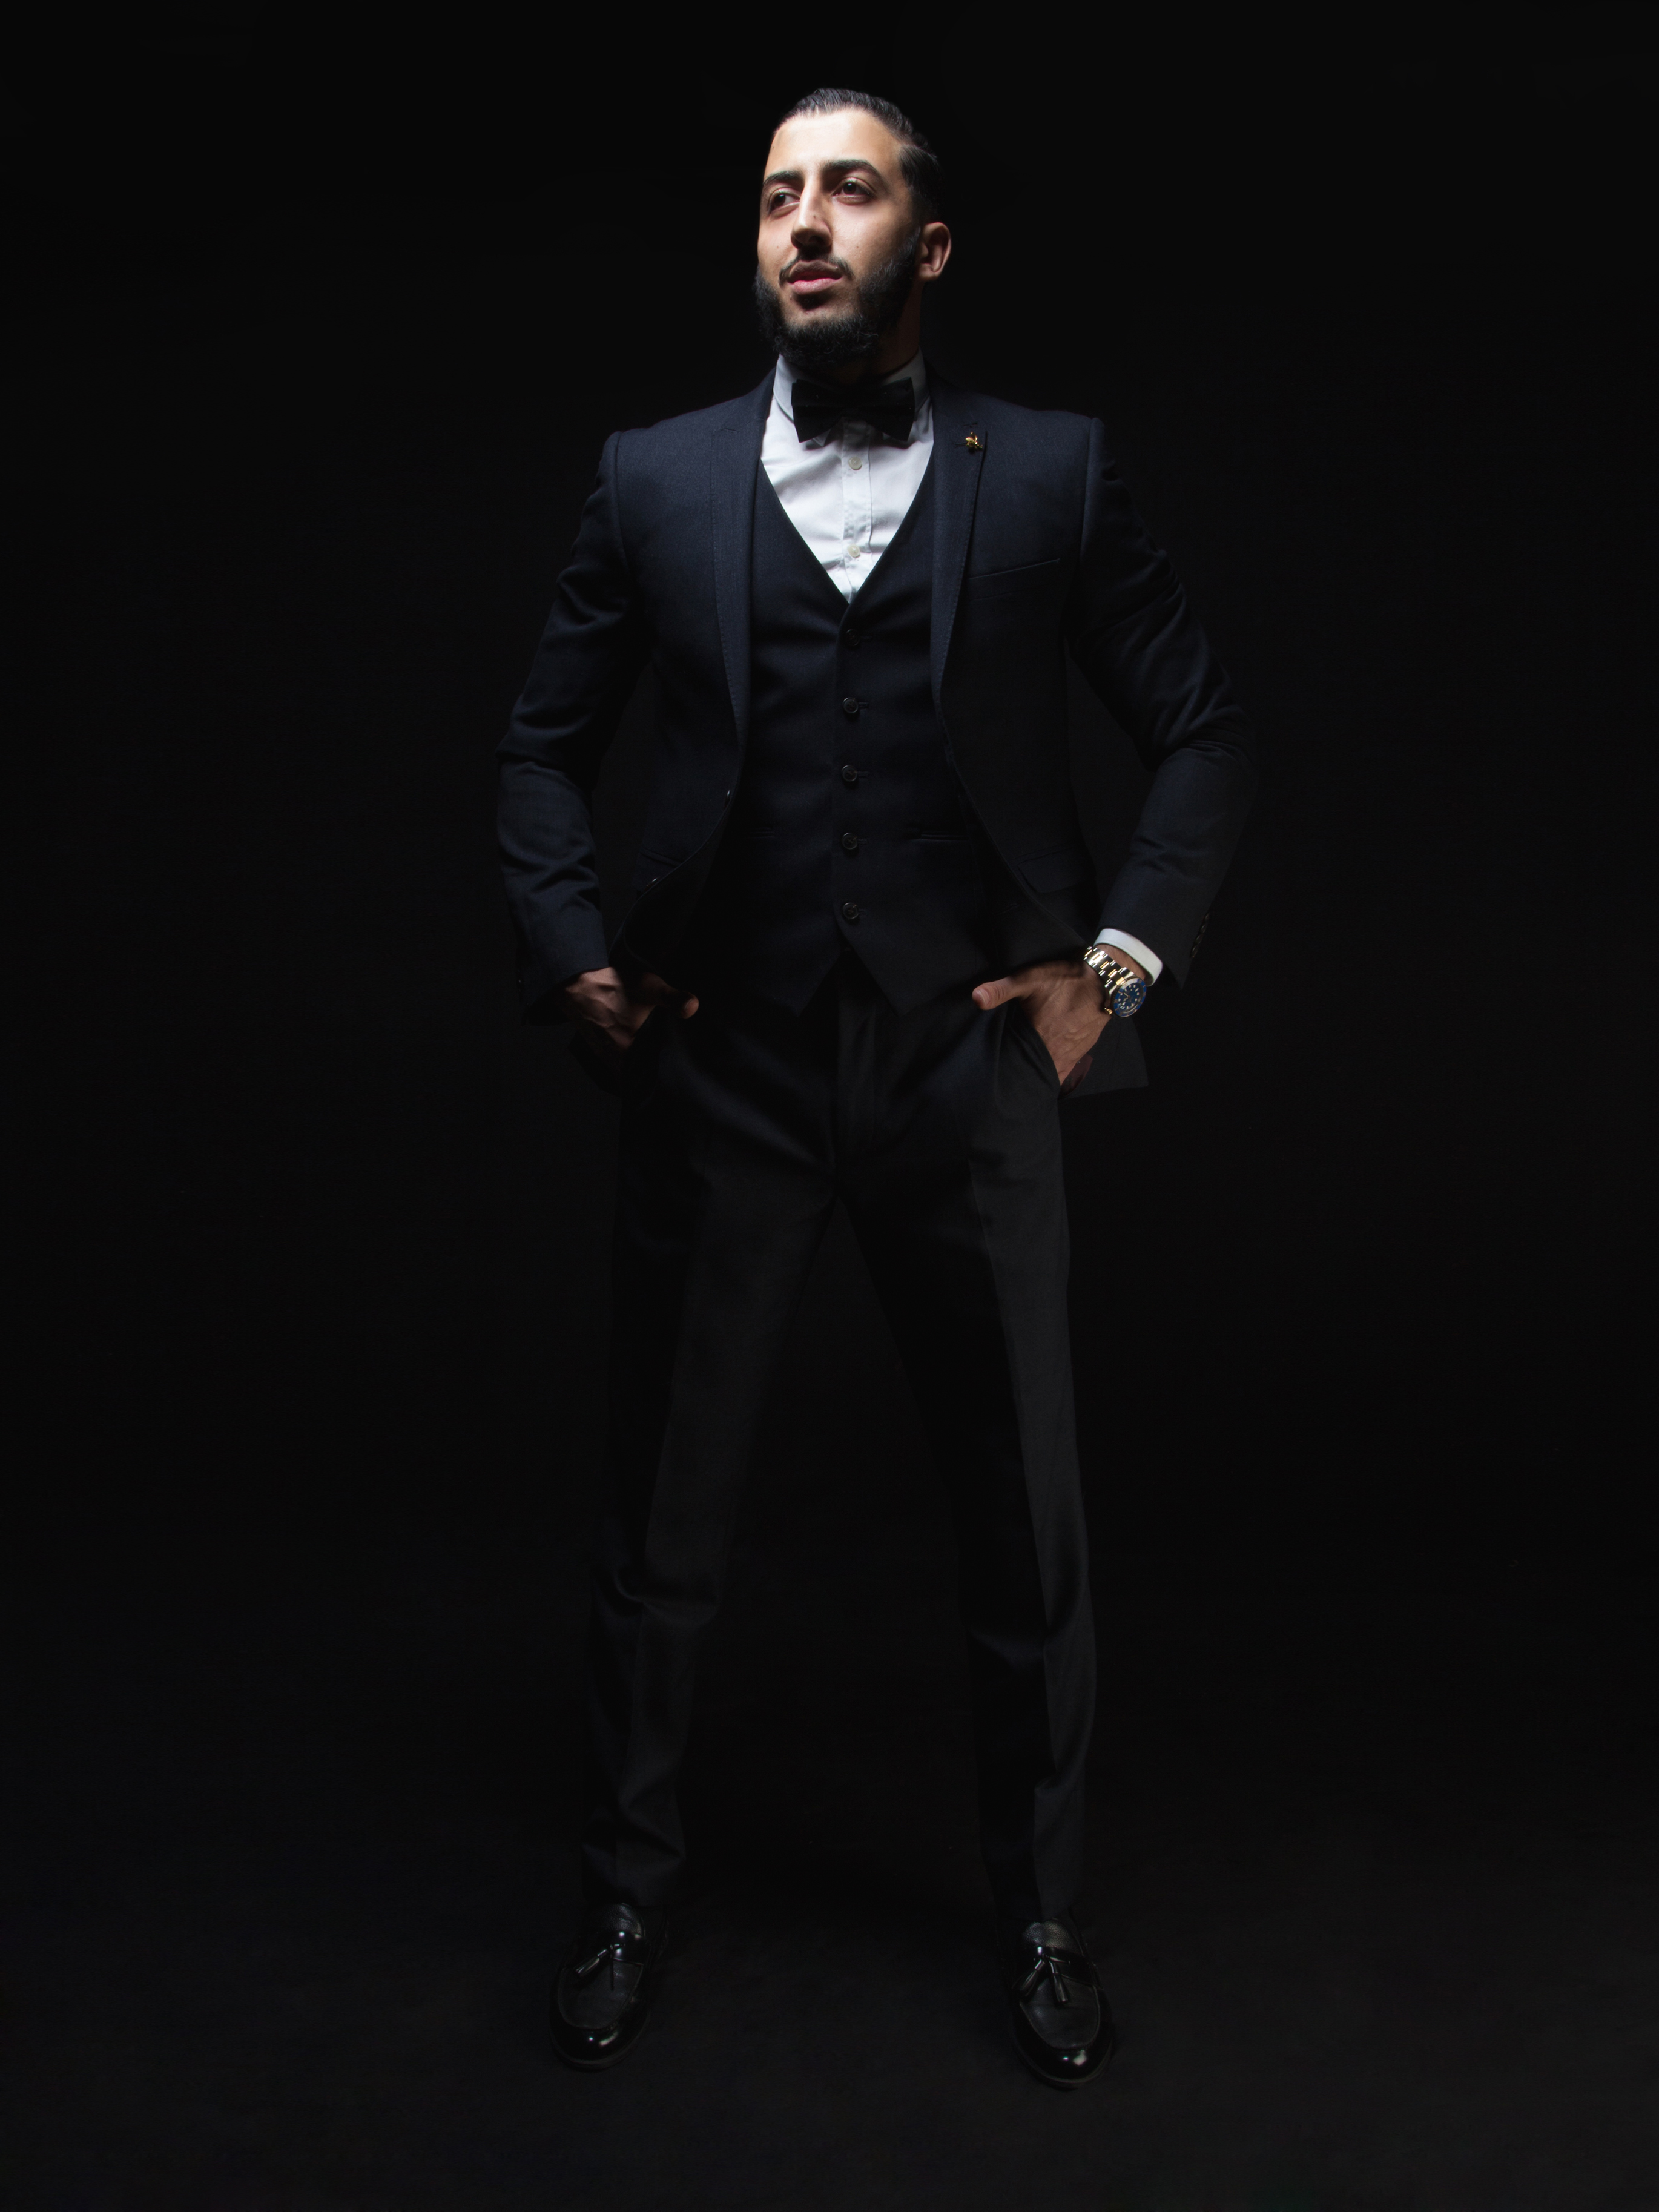 male photoshoot dueller by cameo London photography studio model portfolio